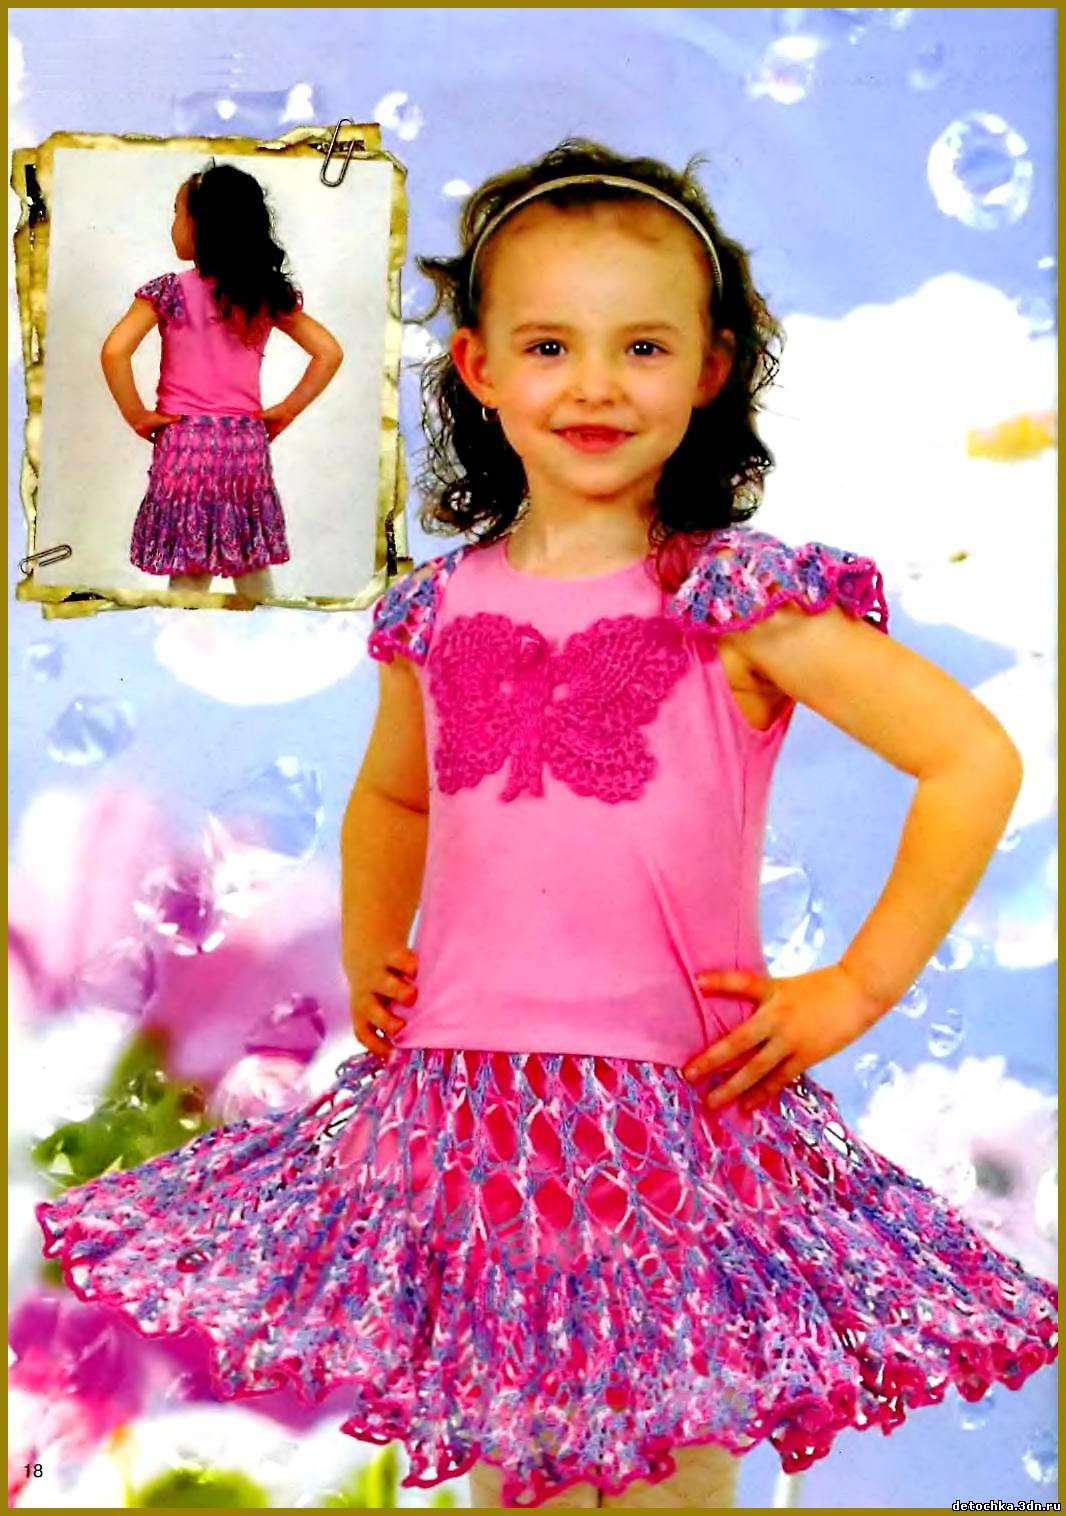 юбка крючком для девочки Вязание. юбка крючком для девочки.